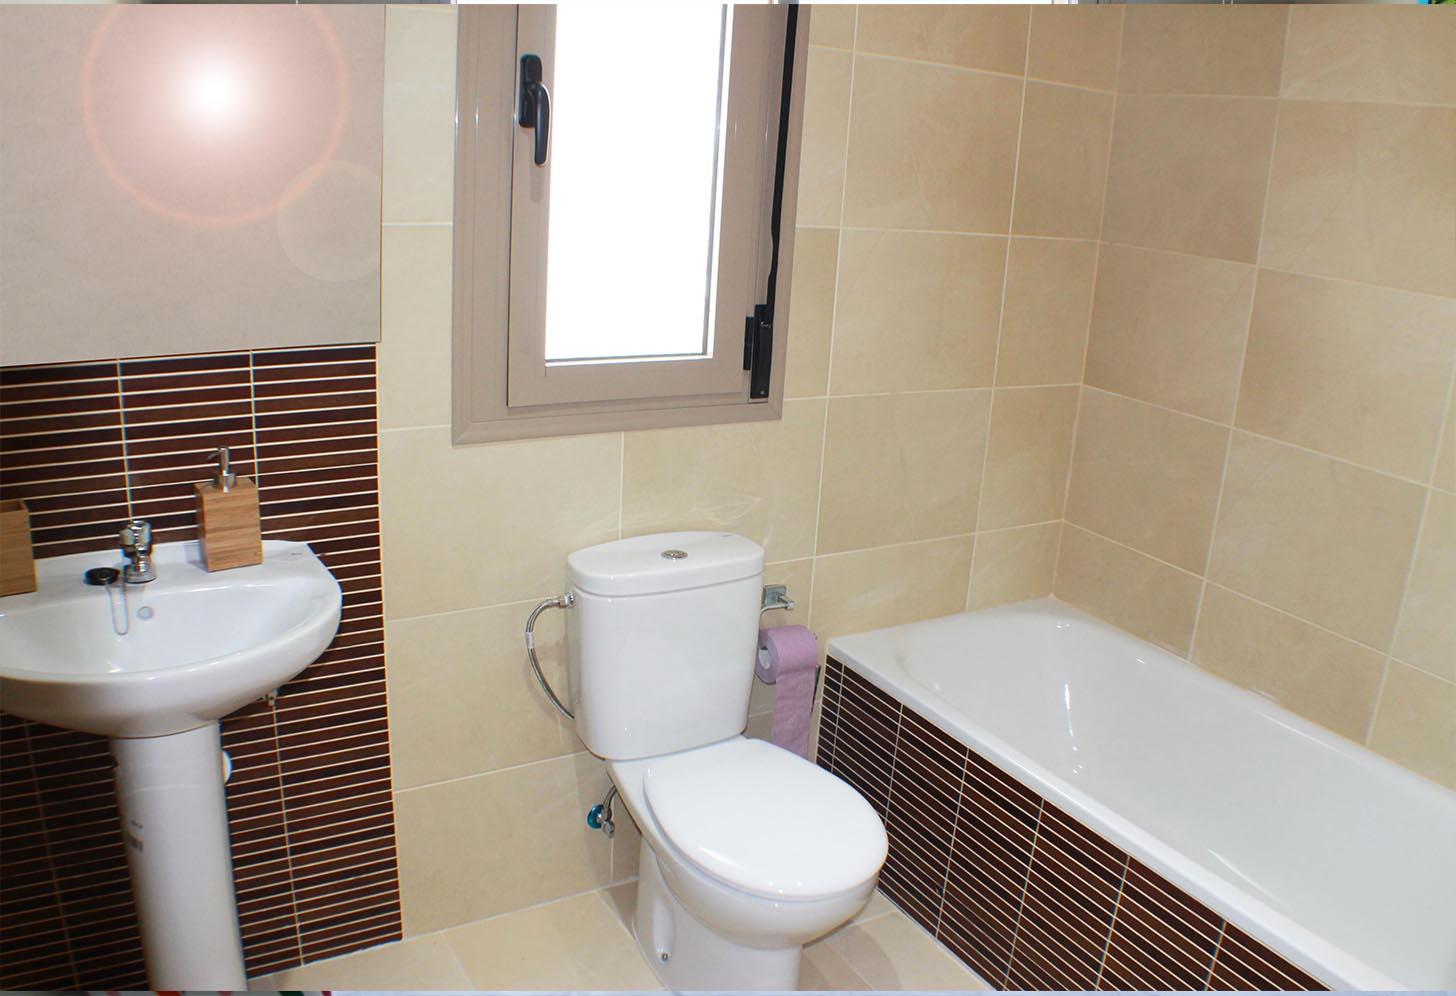 immobilier neuf espagne costa blanca on-d10 la isla villas sdb